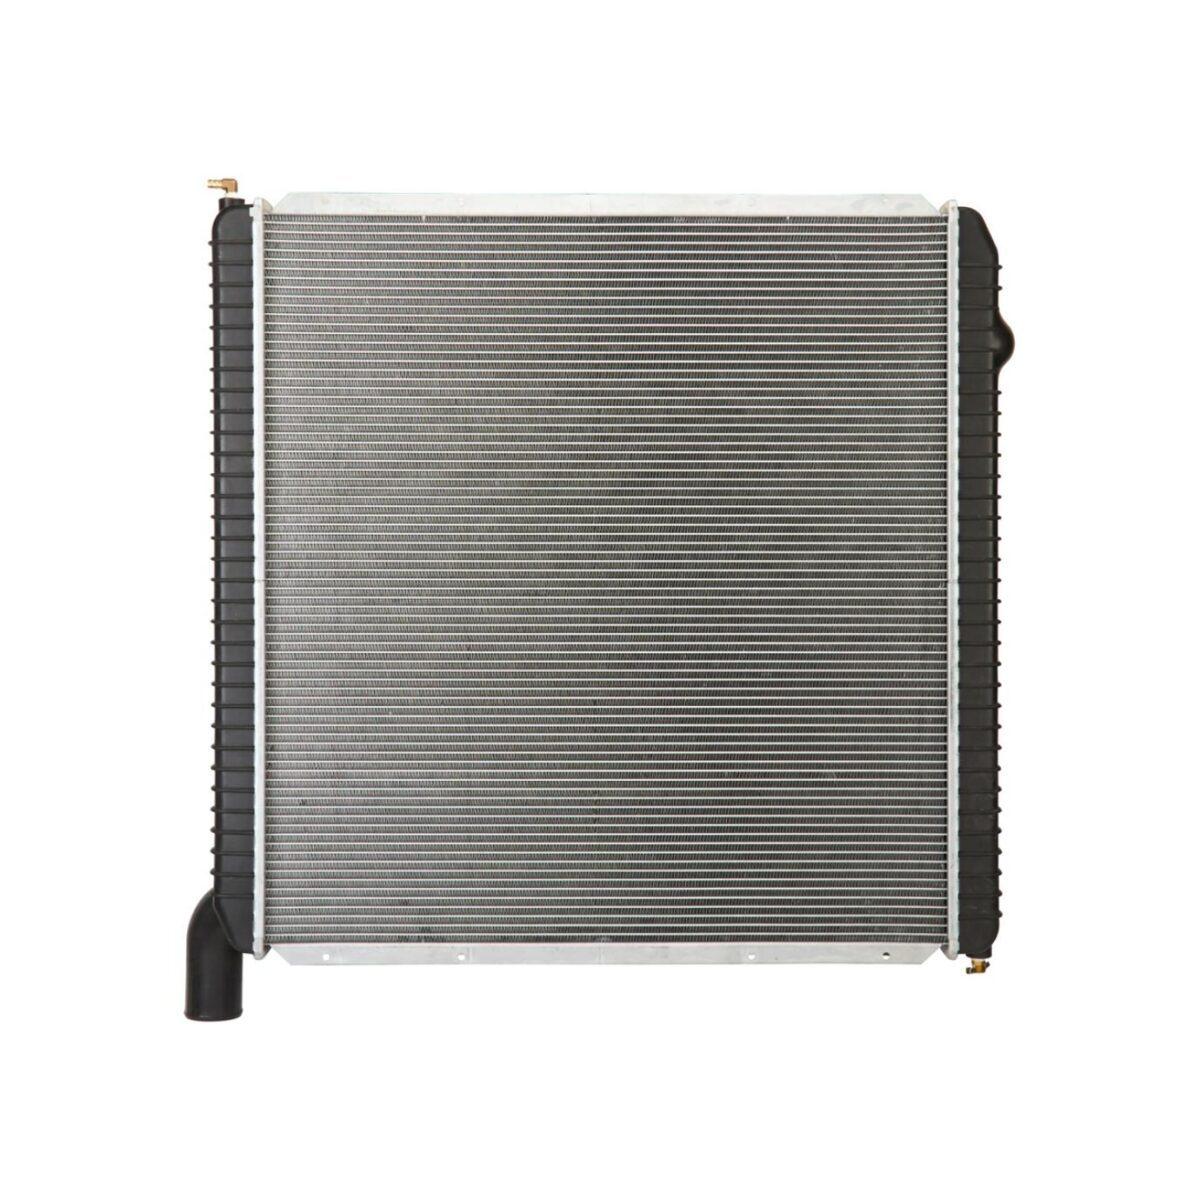 international 5000550056005900 series 04 09 radiator oem 3e0100670000